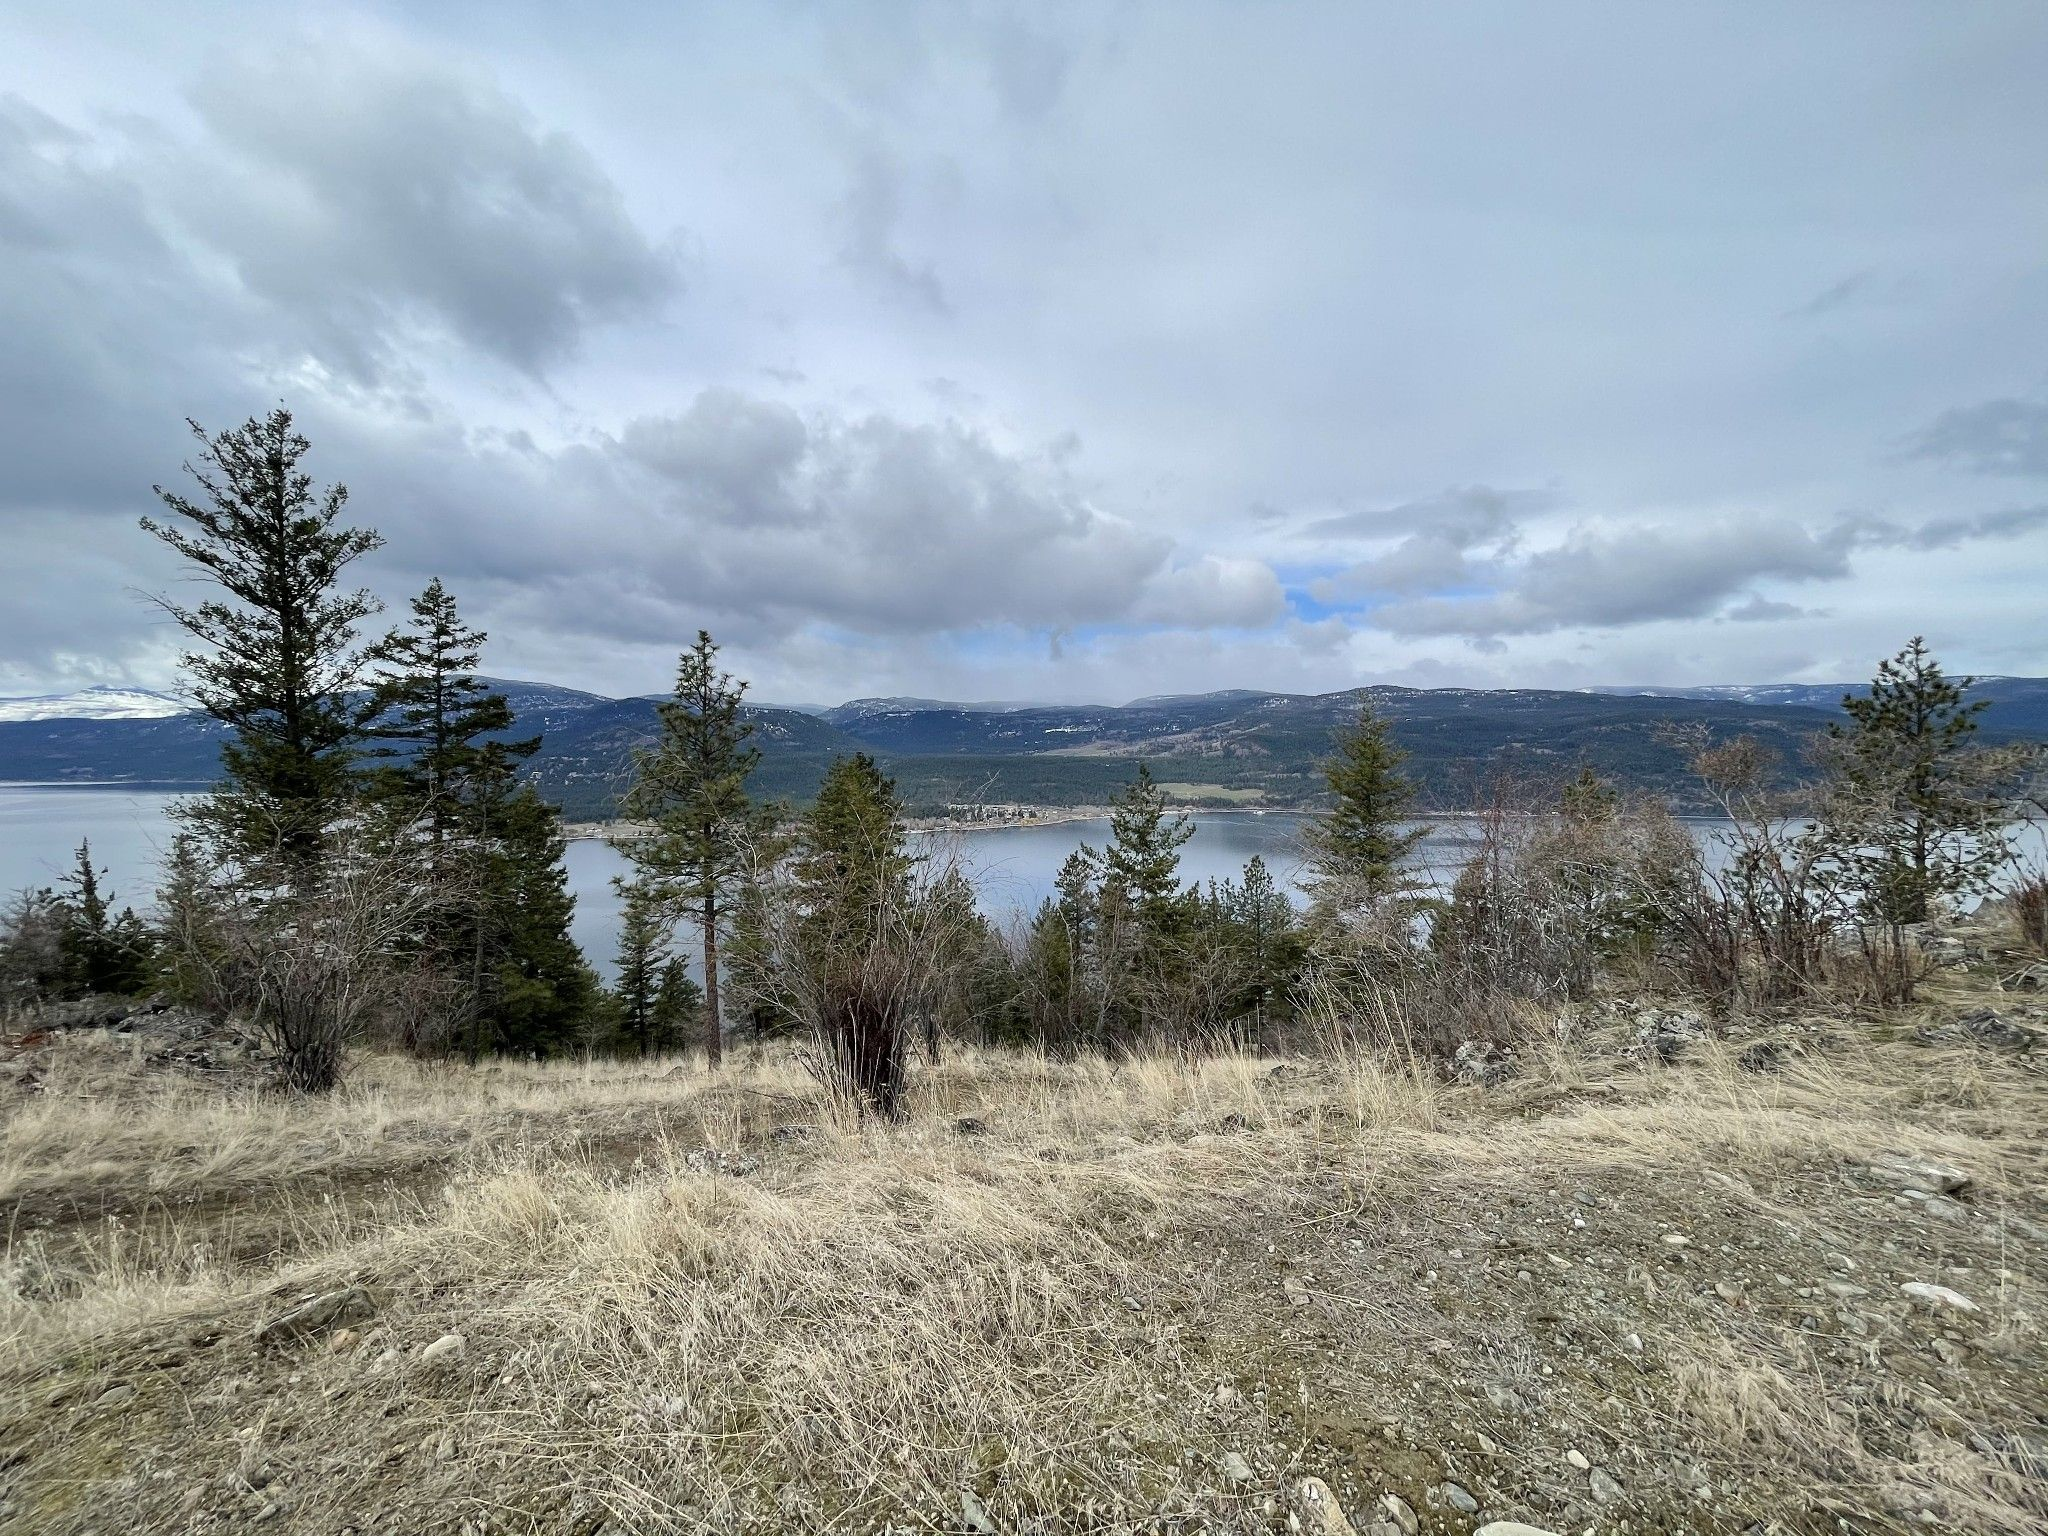 Main Photo: 9030 Tavistock Road in Vernon: Adventure Bay Vacant Land for sale (North Okanagan)  : MLS®# 10228475